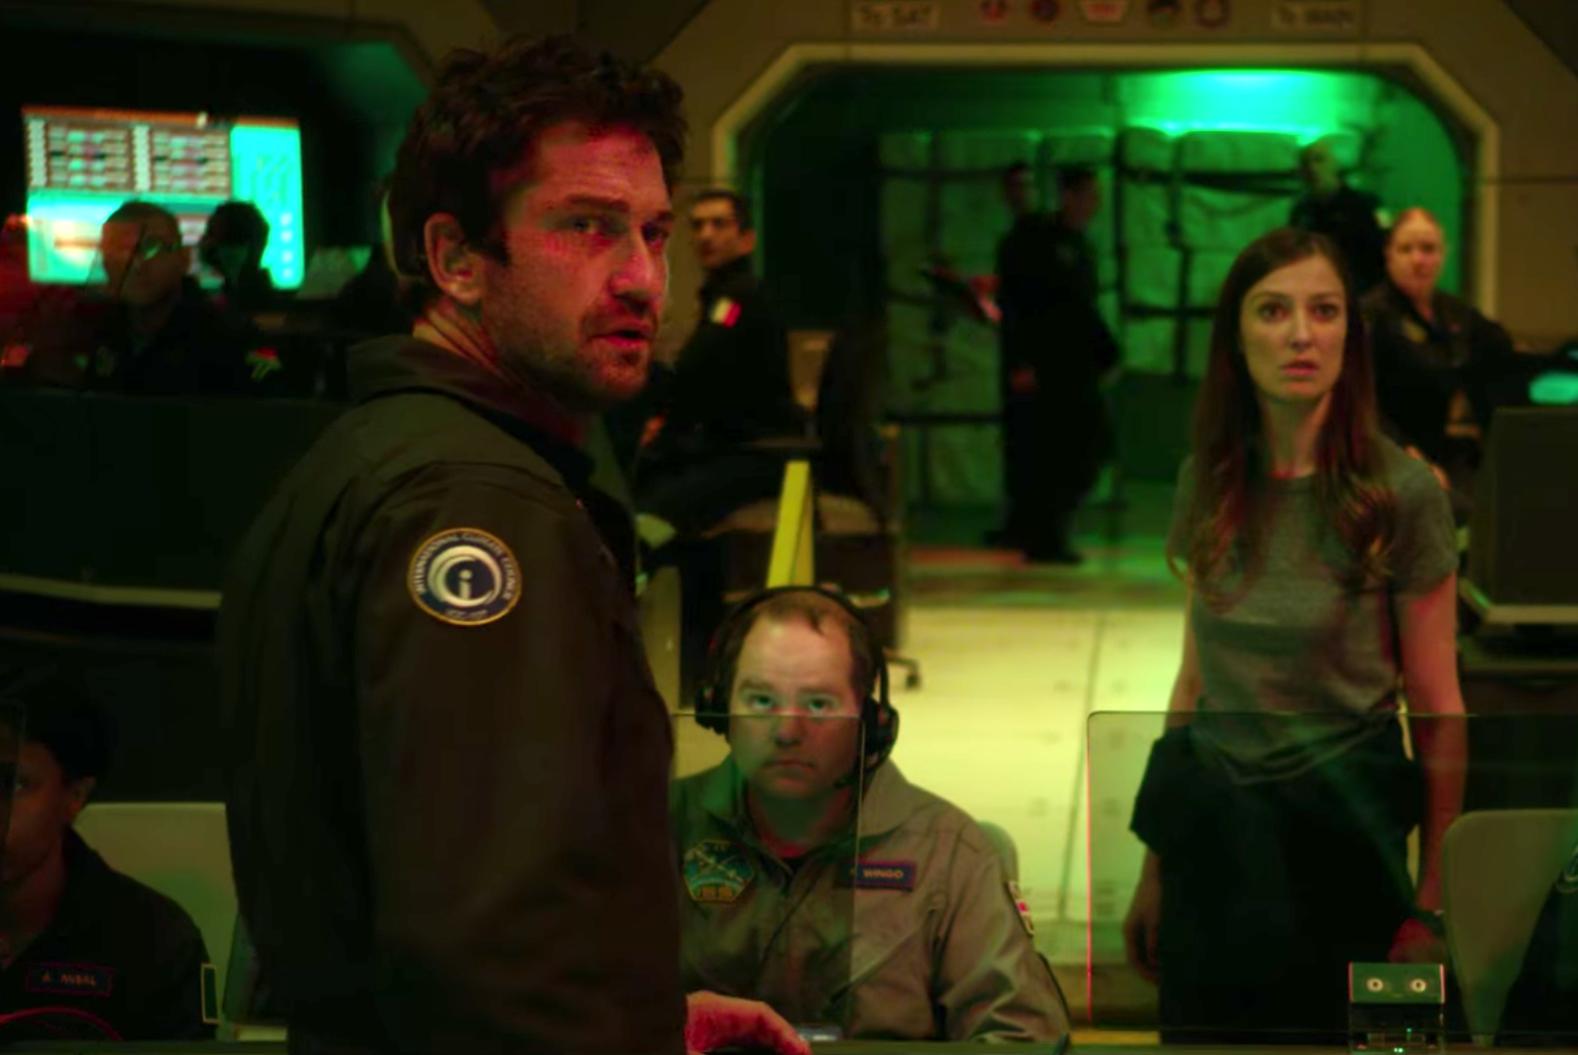 Gerard Butler in Geostorm trailer